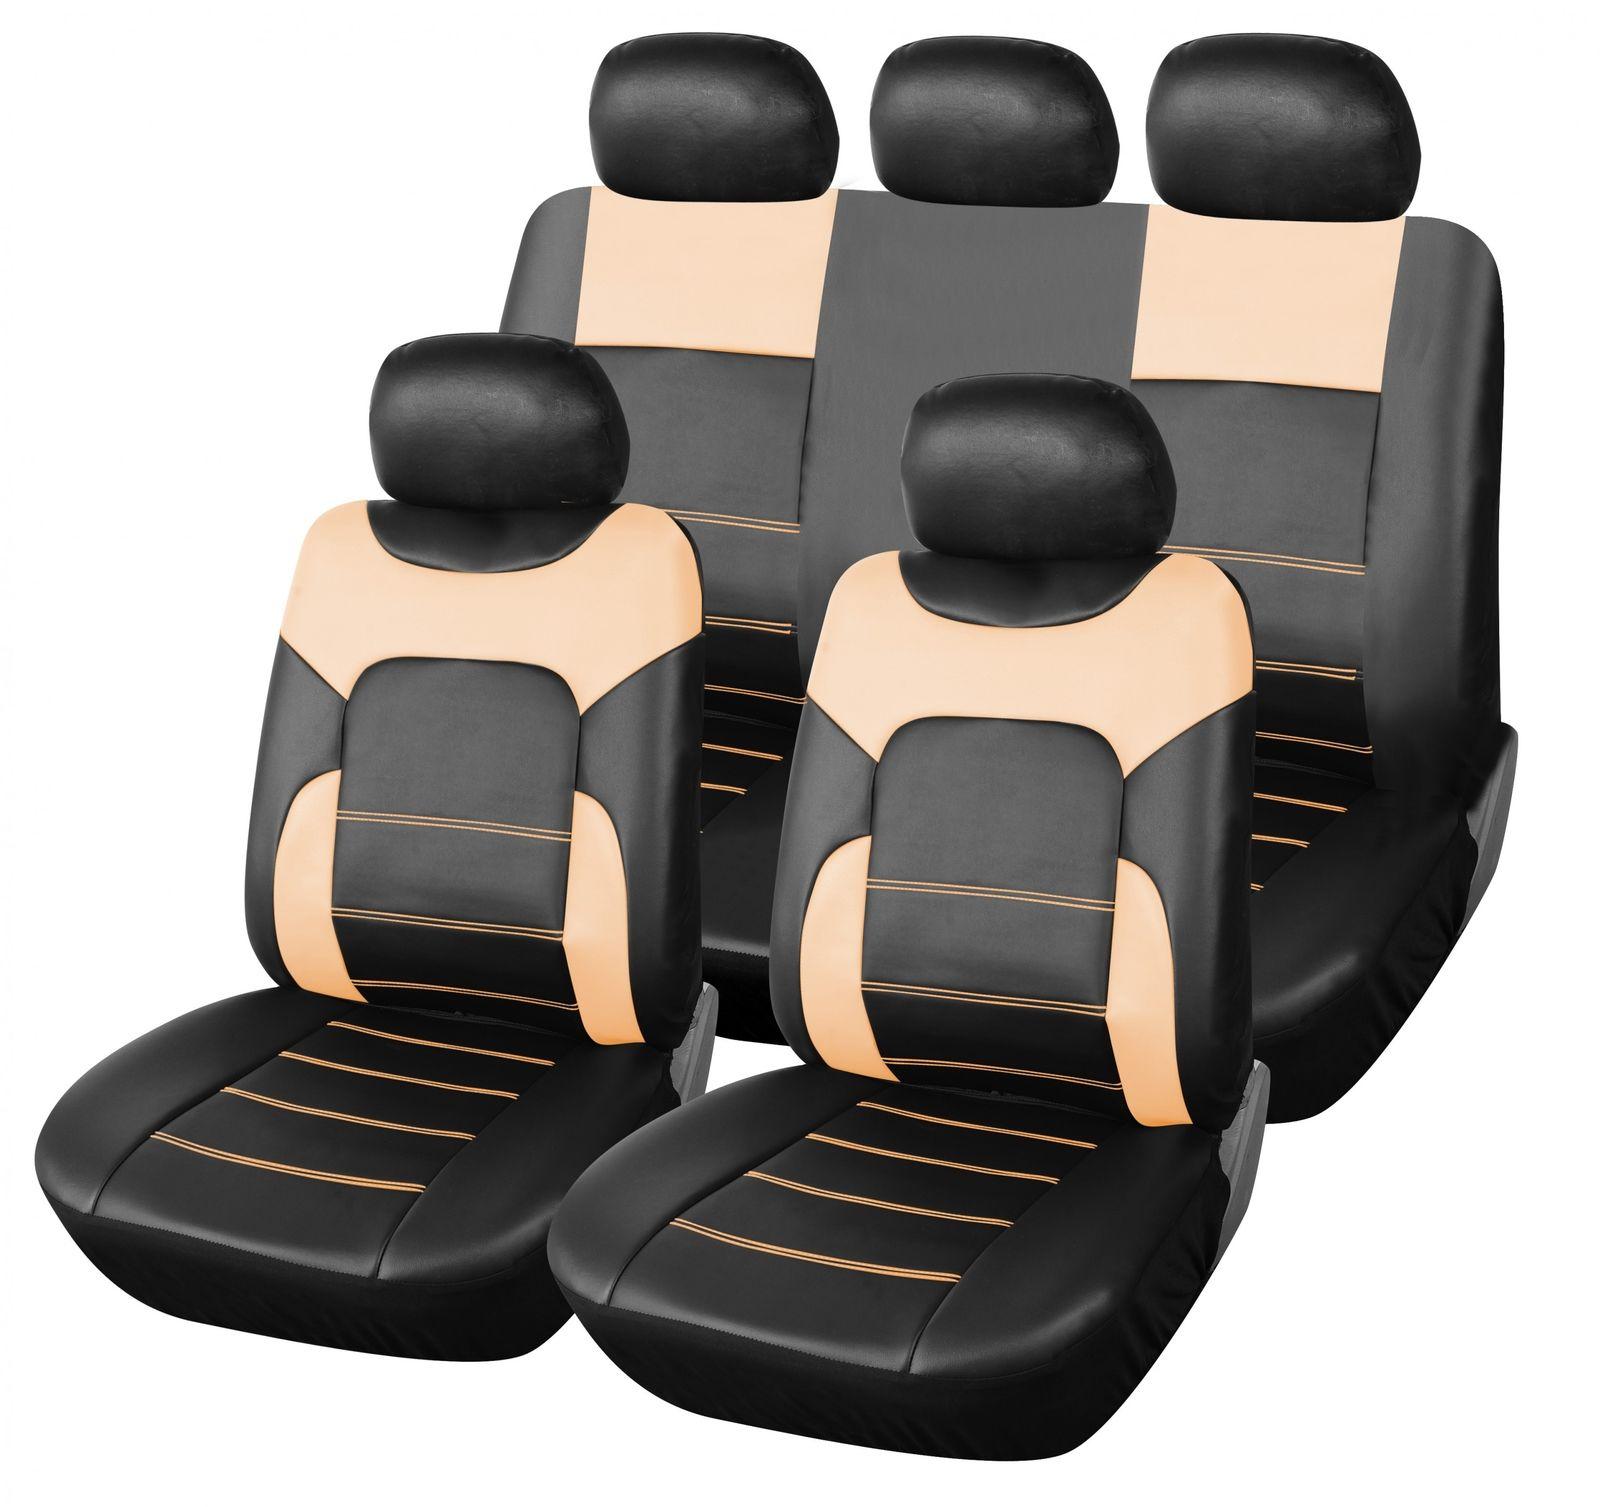 Auto Schonbezüge Kunstleder Sitzbezug Sitzbezüge Universal Schonbezug beige